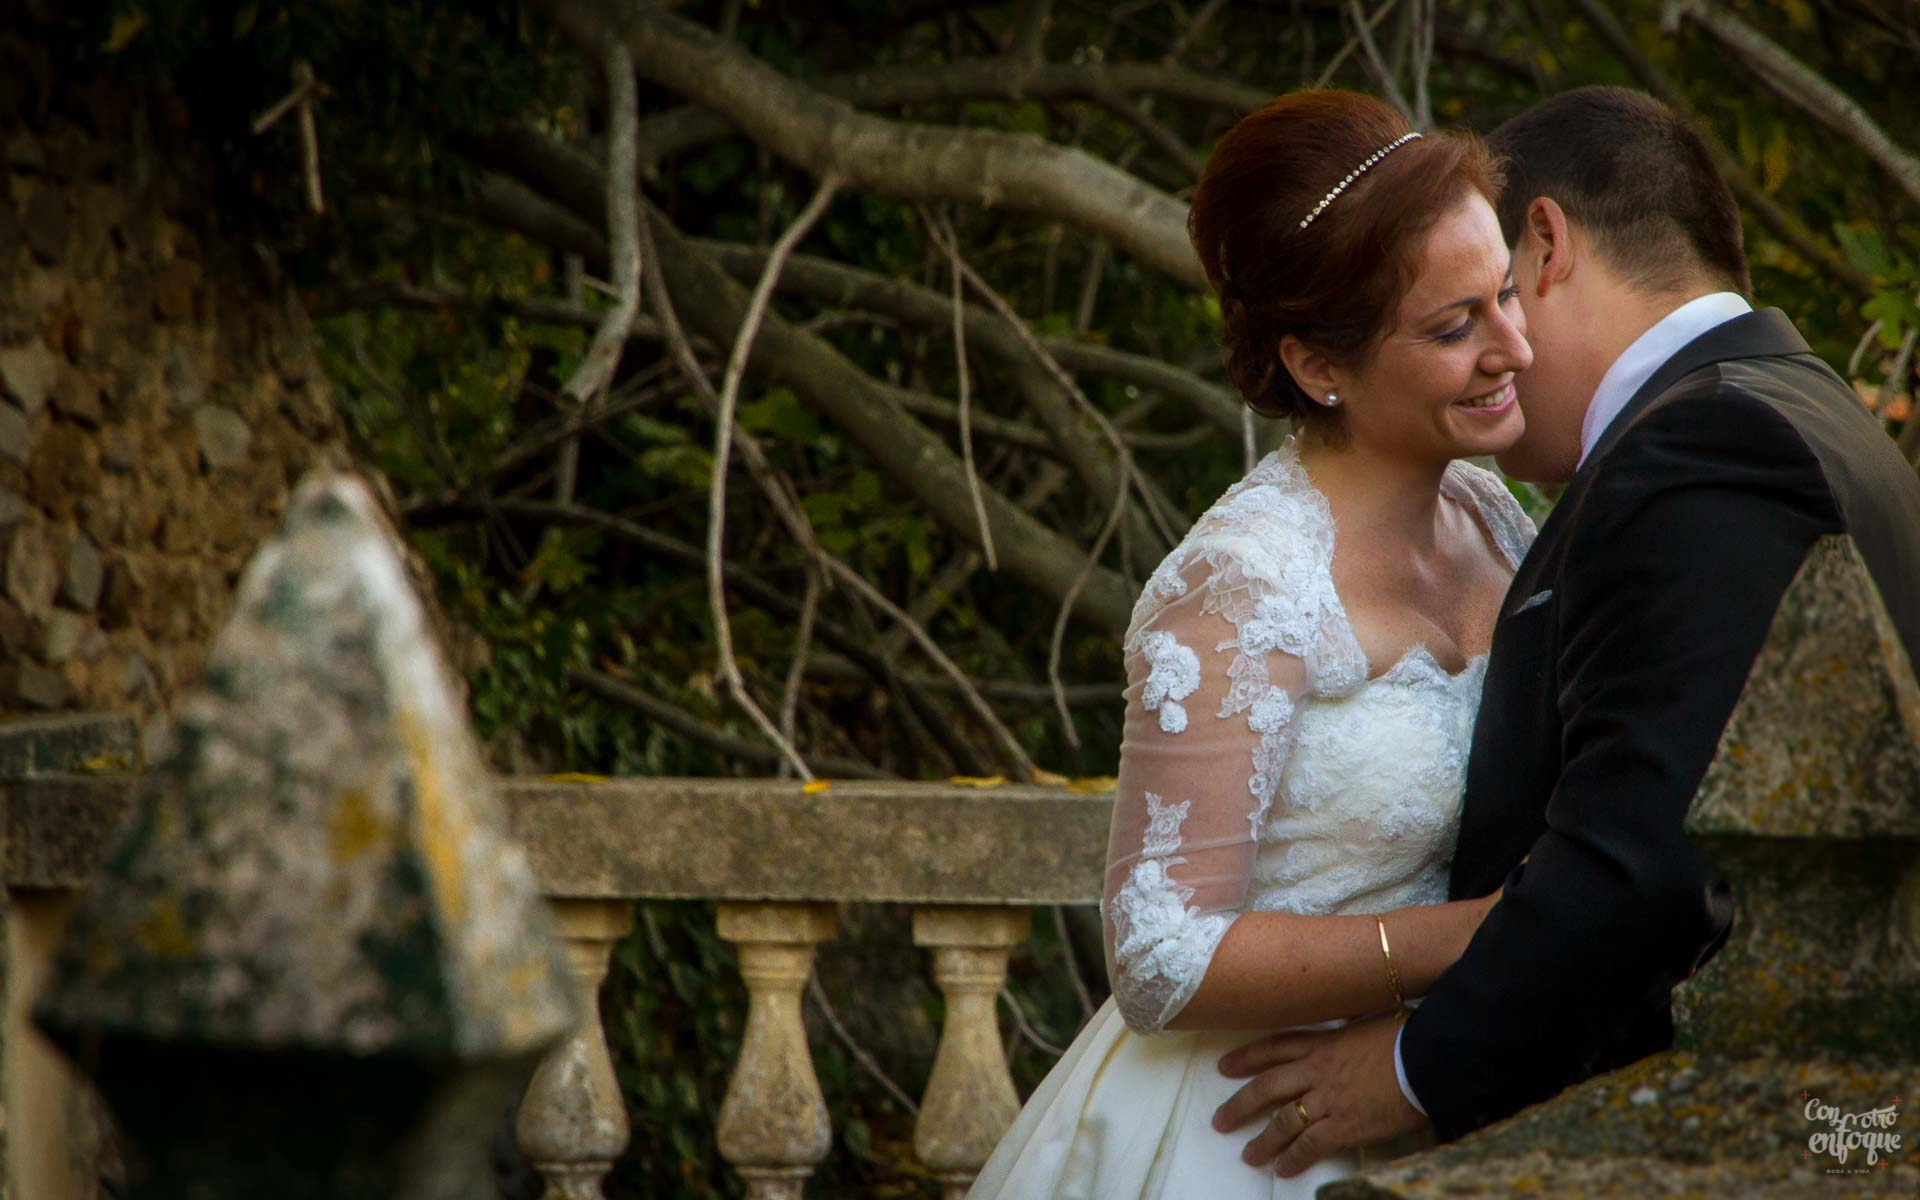 autumn wedding slow tu boda en otoño fotógrafos de boda diferentes